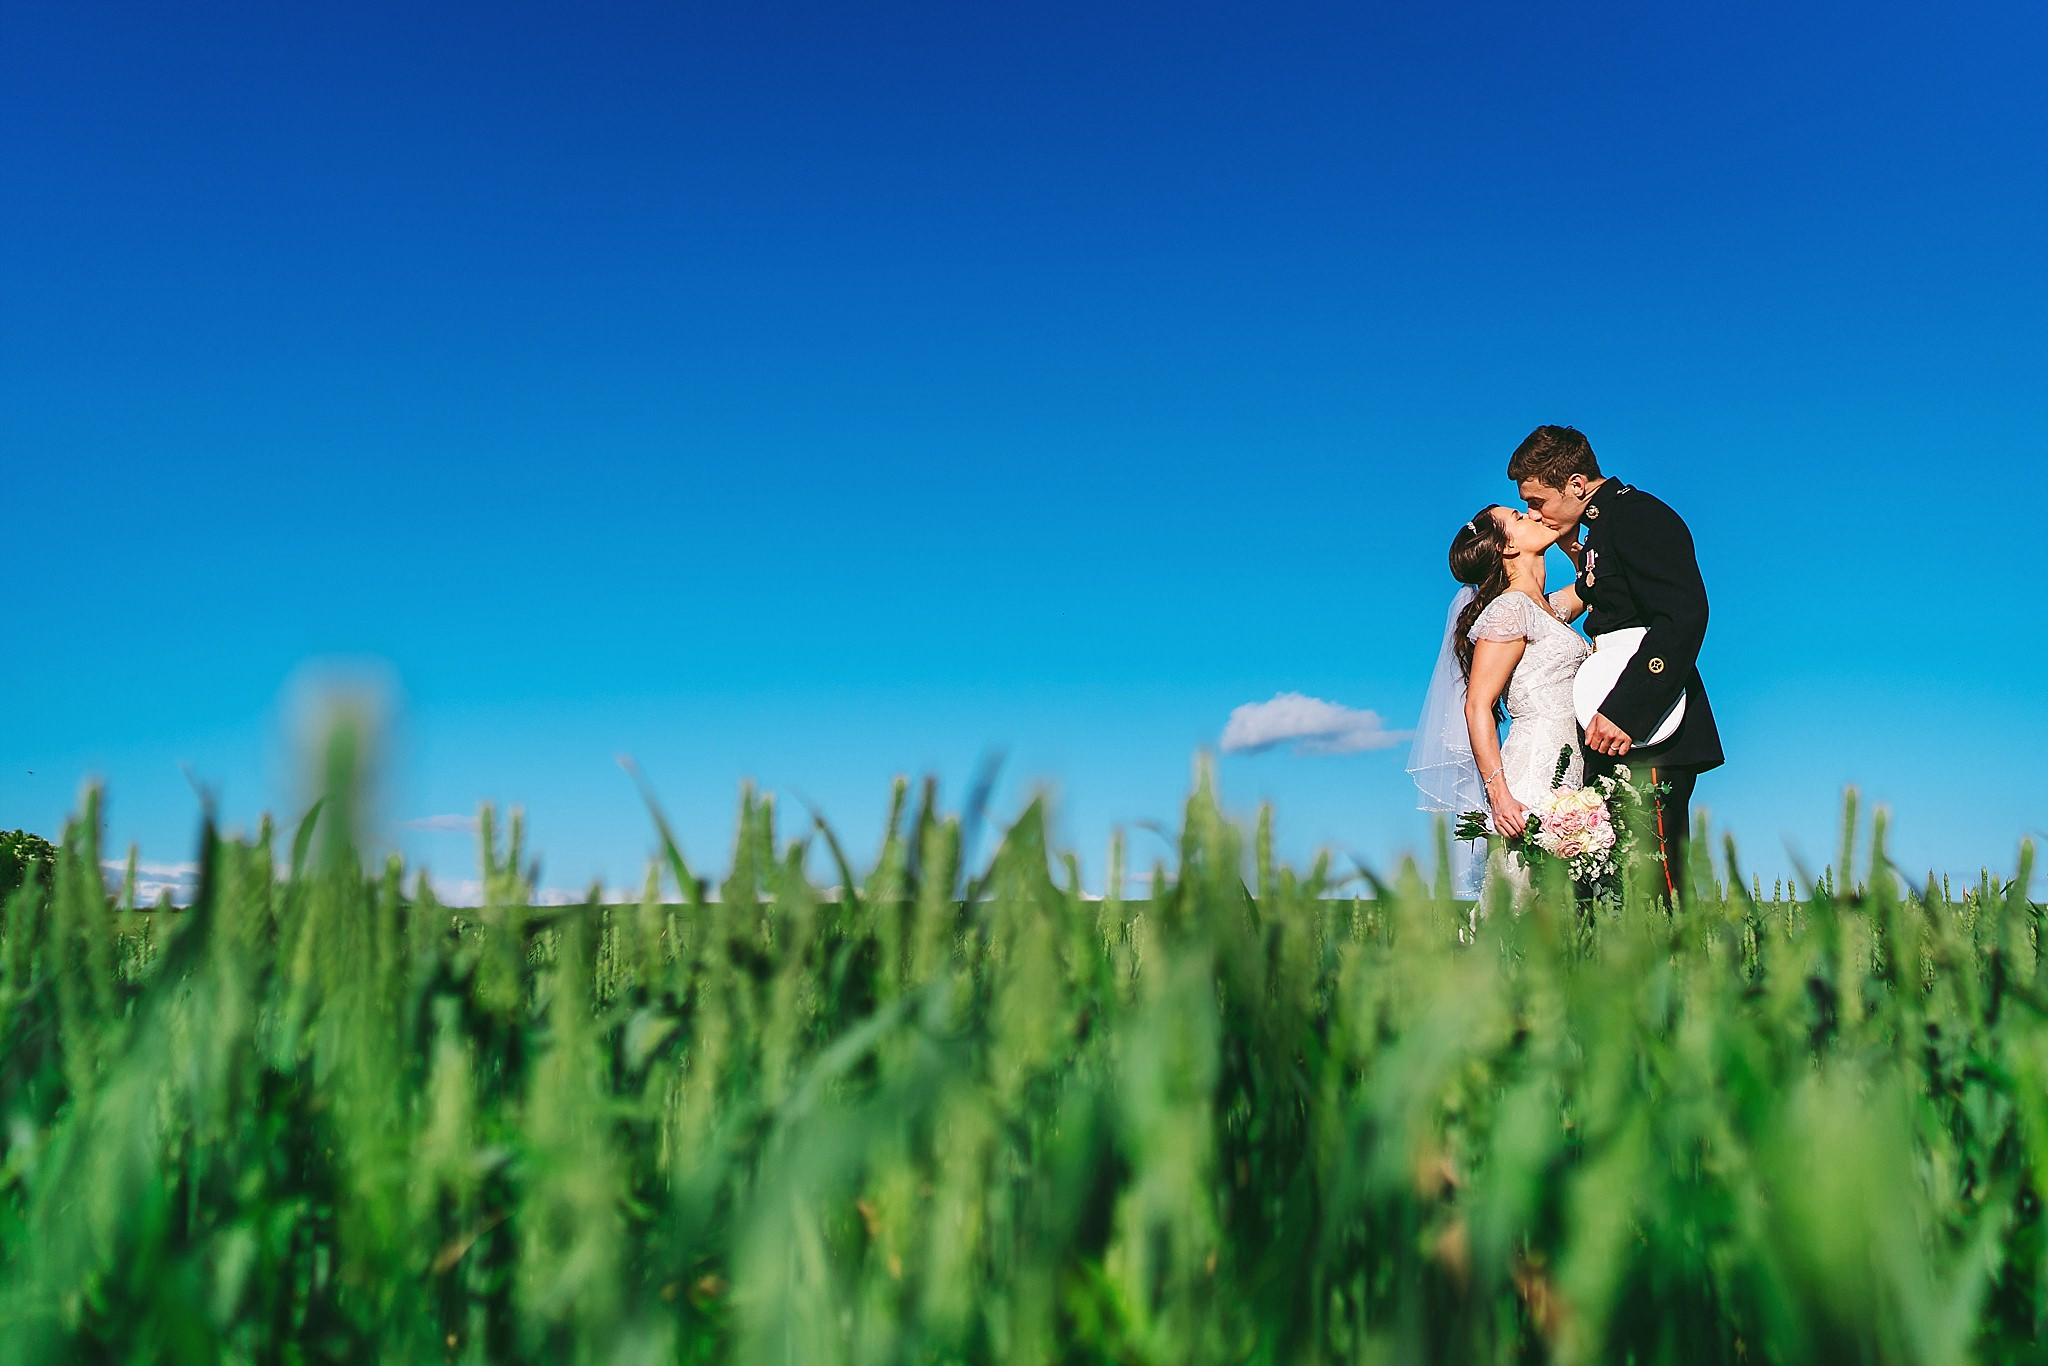 aga-tomaszek-wedding-photographer-cardiff-2016_1102